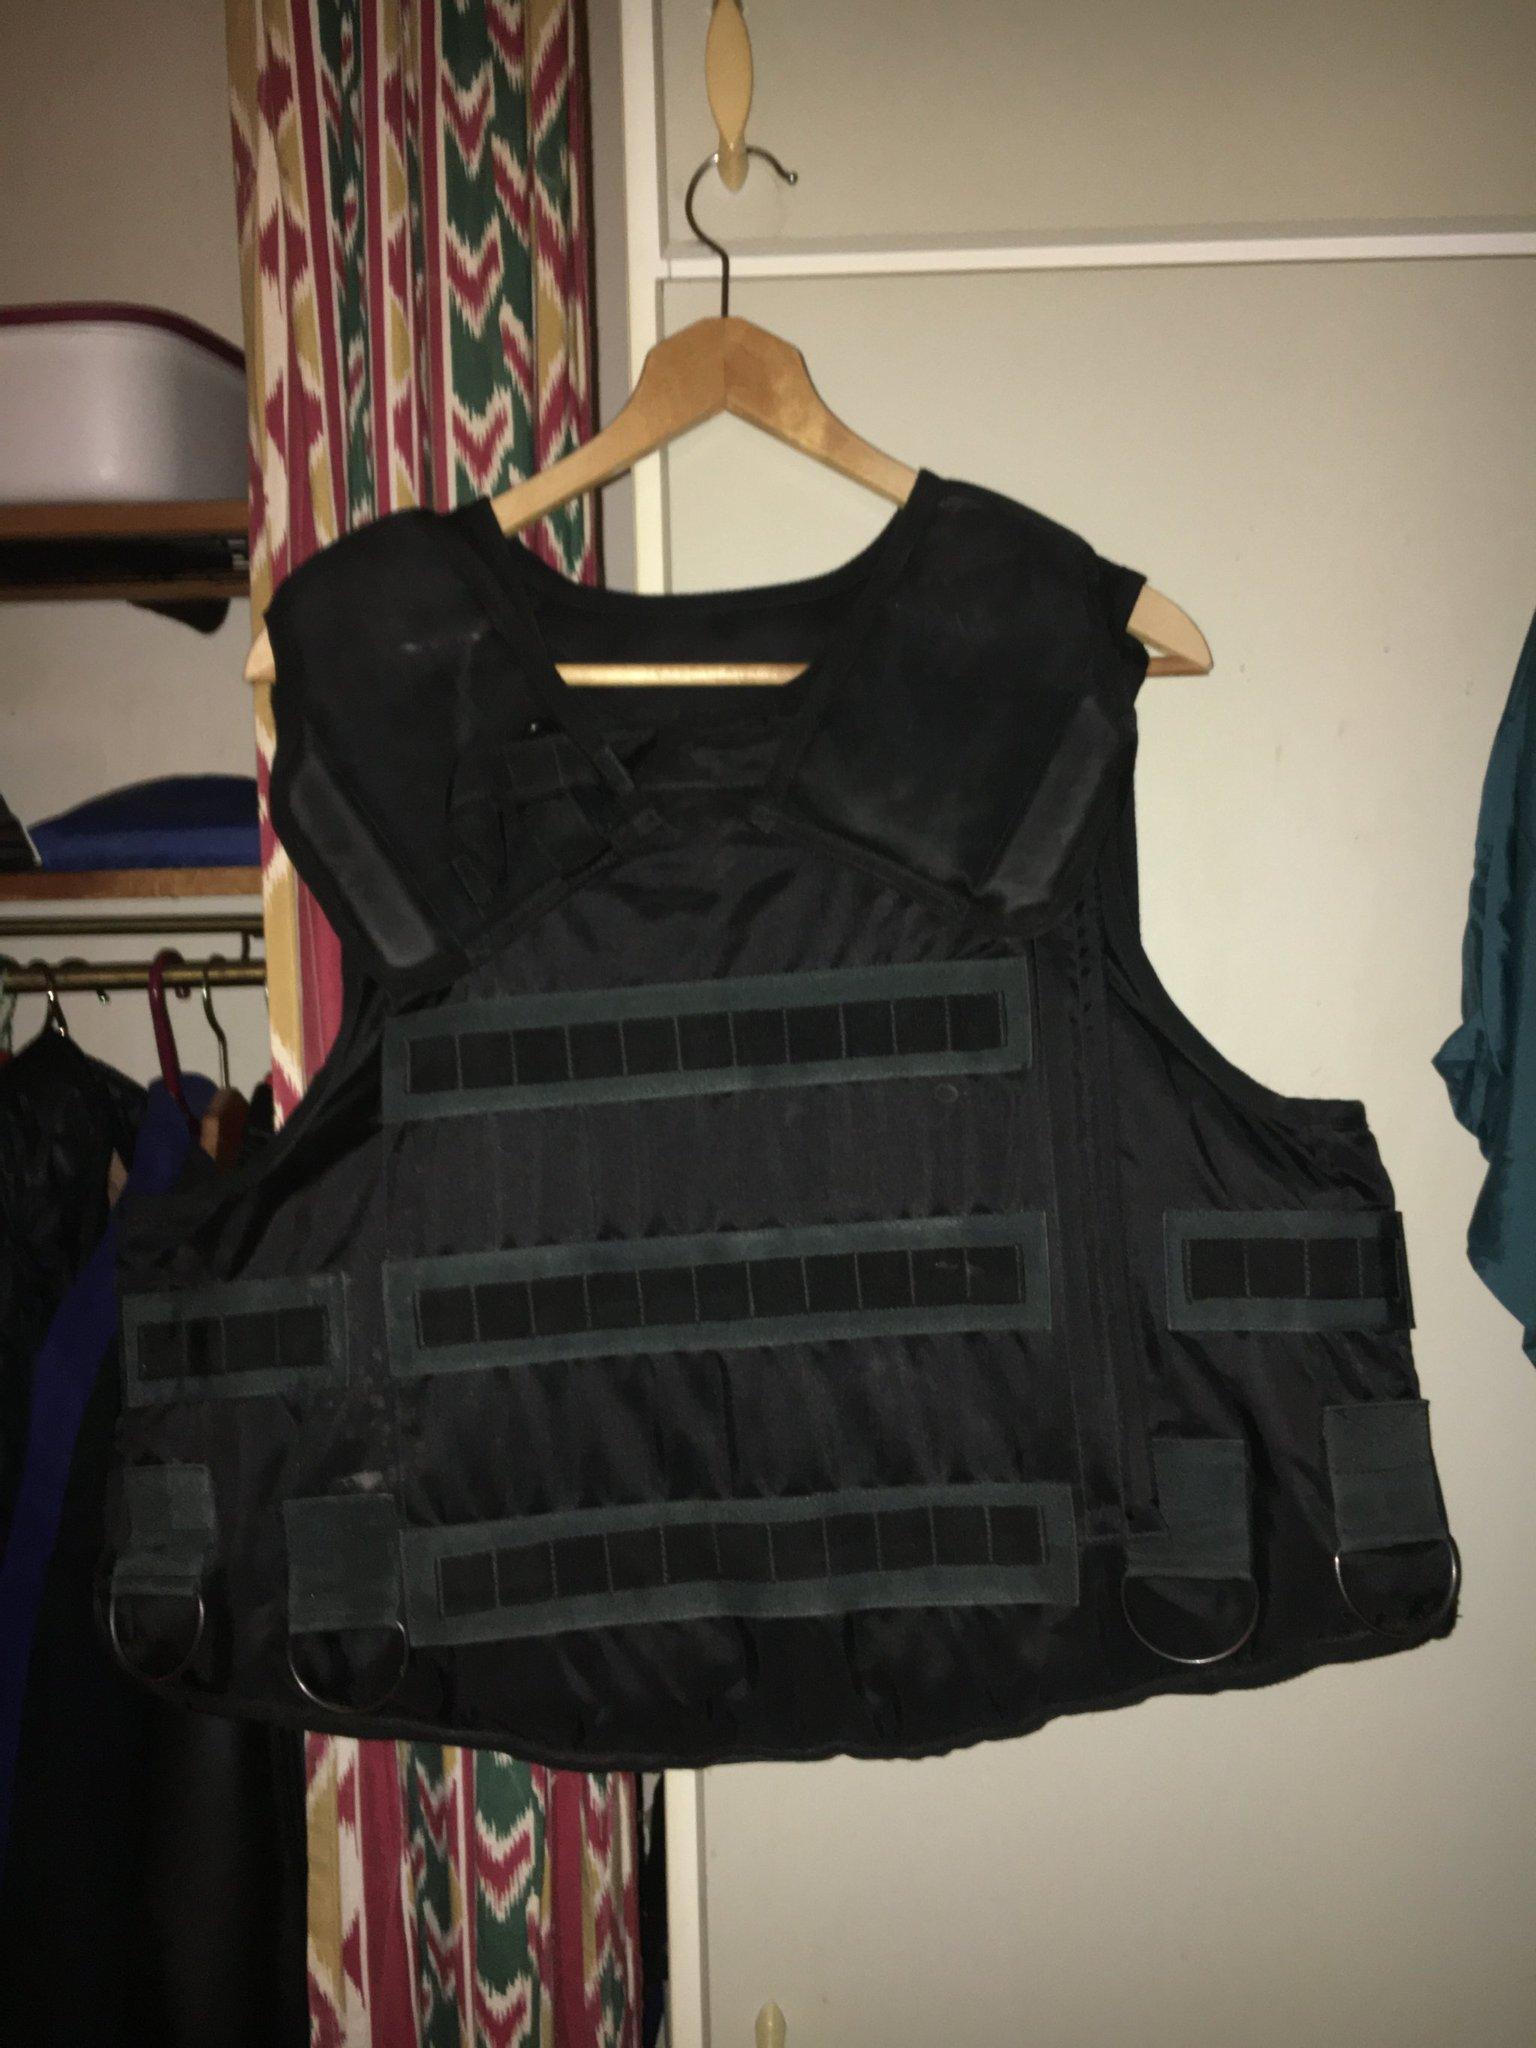 Body Armour Upplands Väsby